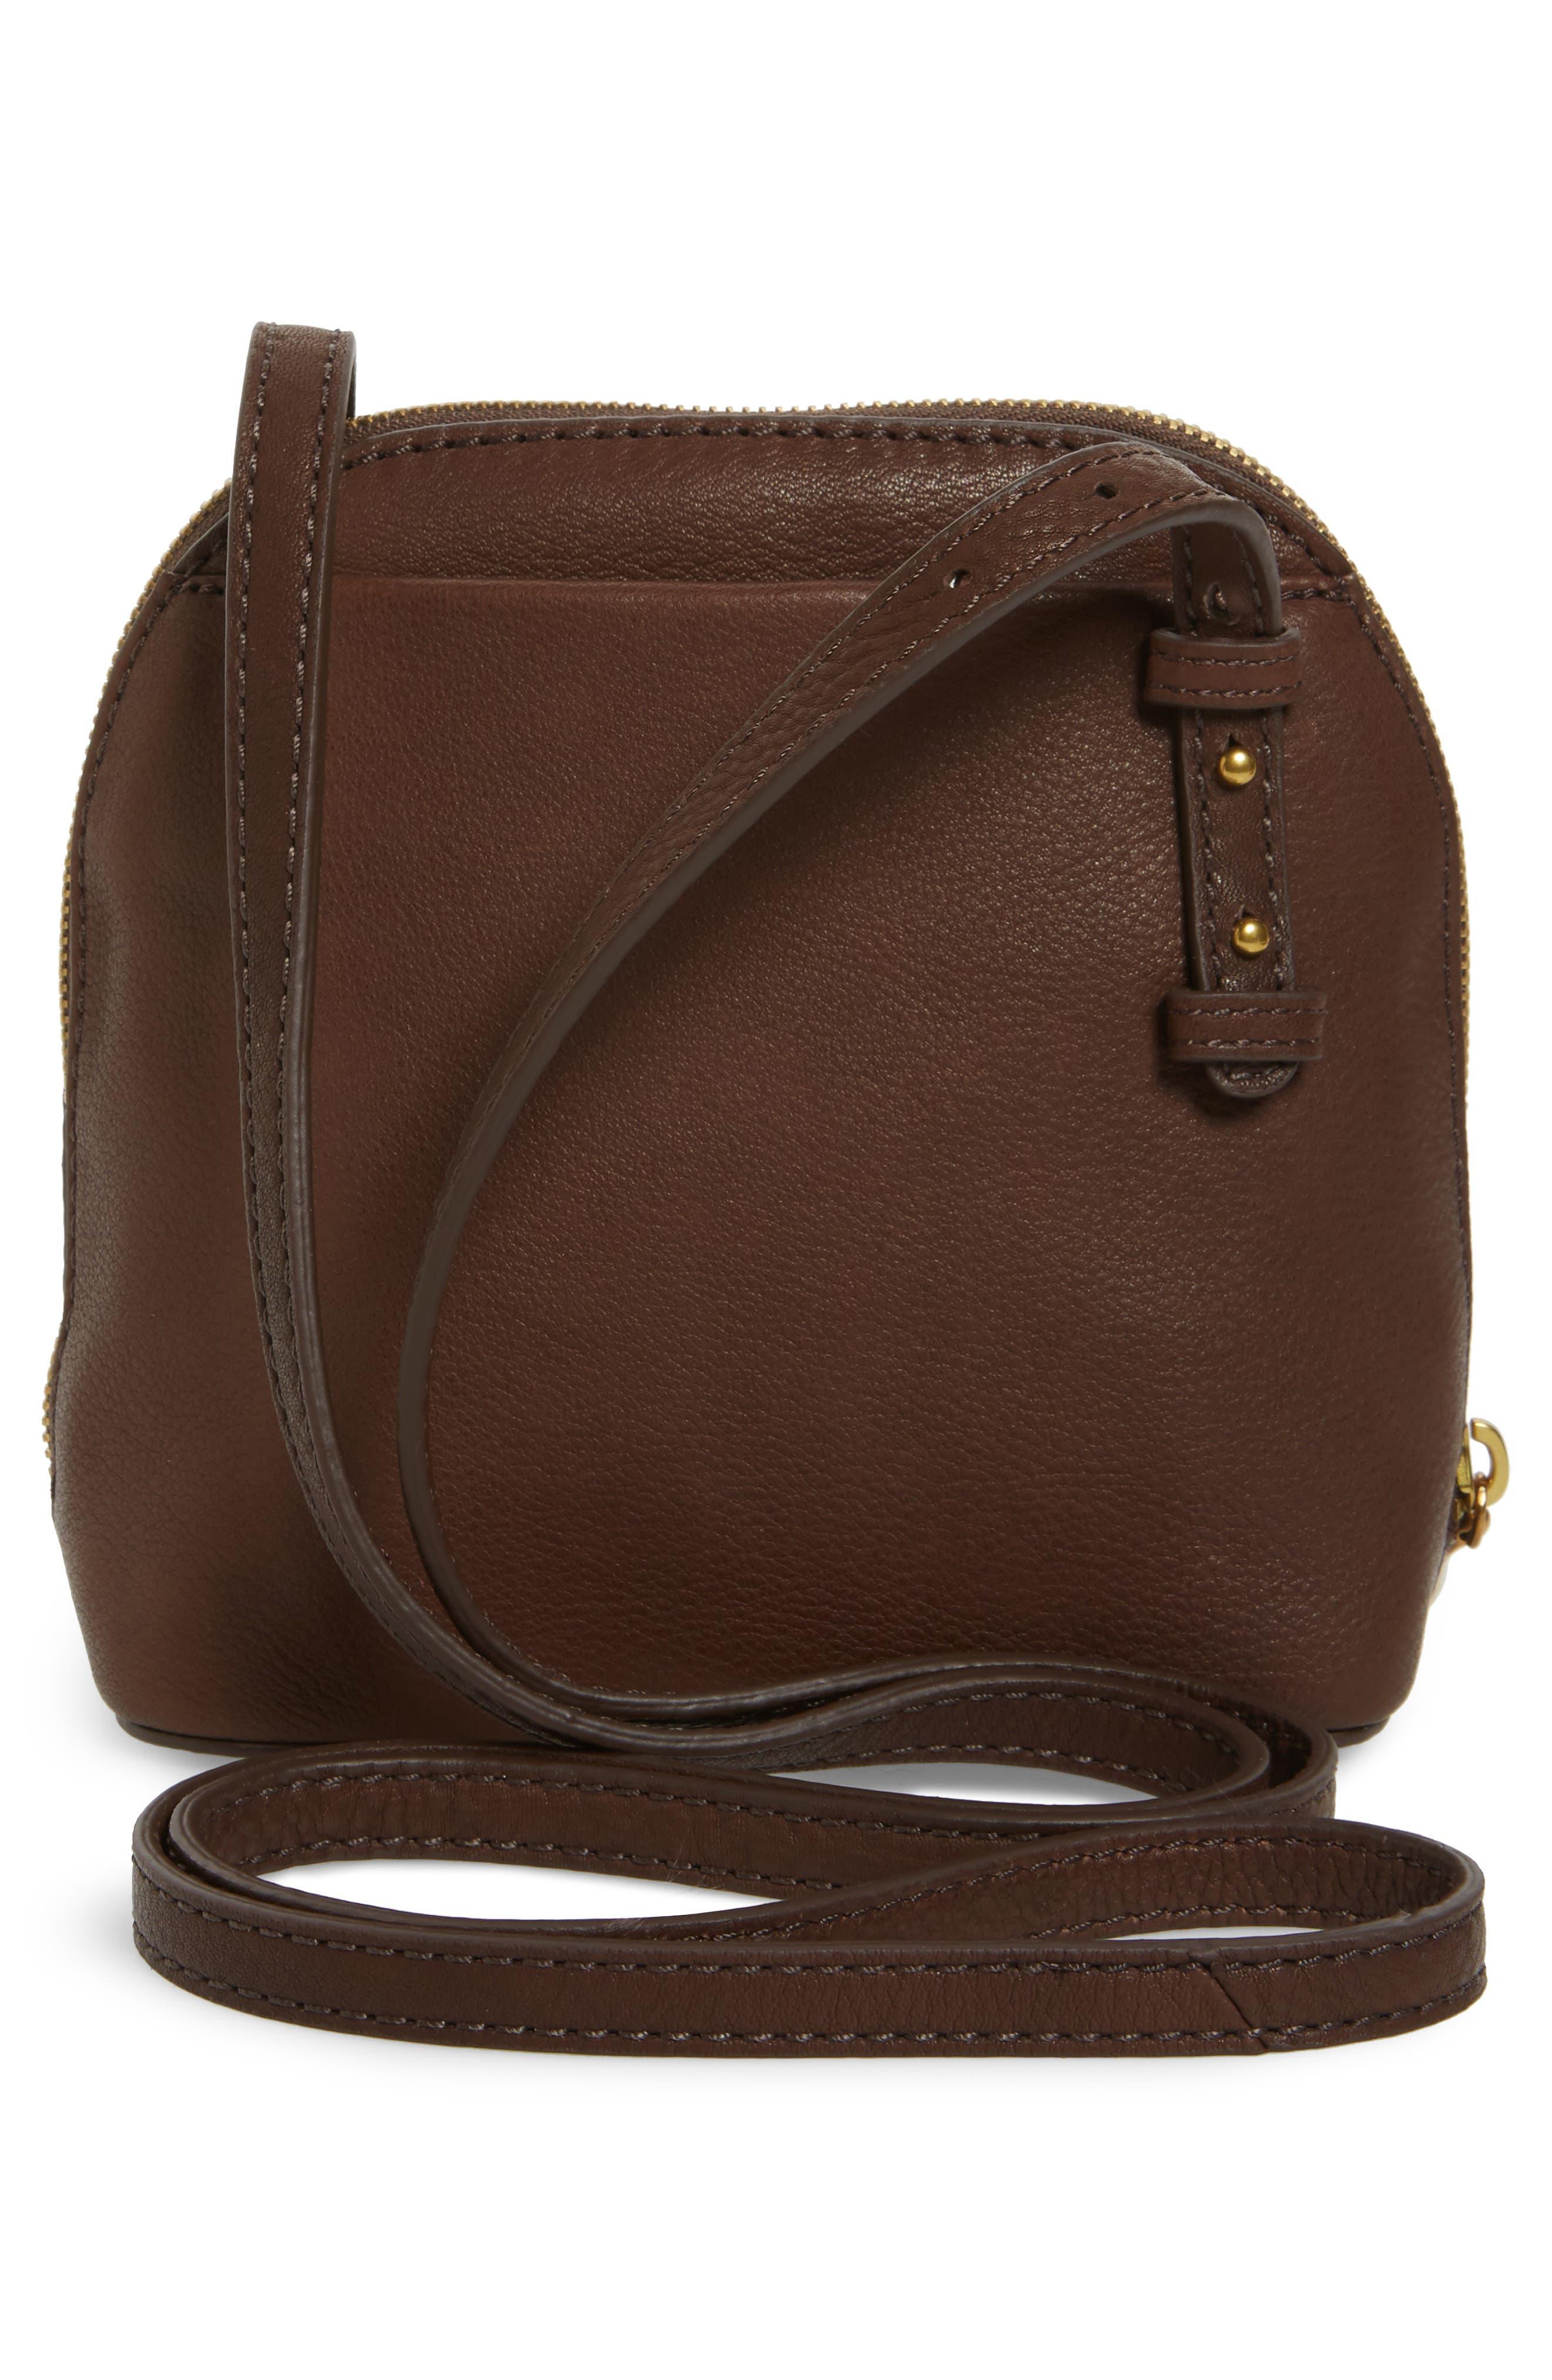 Alternate Image 2  - Hobo Nash Calfskin Leather Crossbody Bag